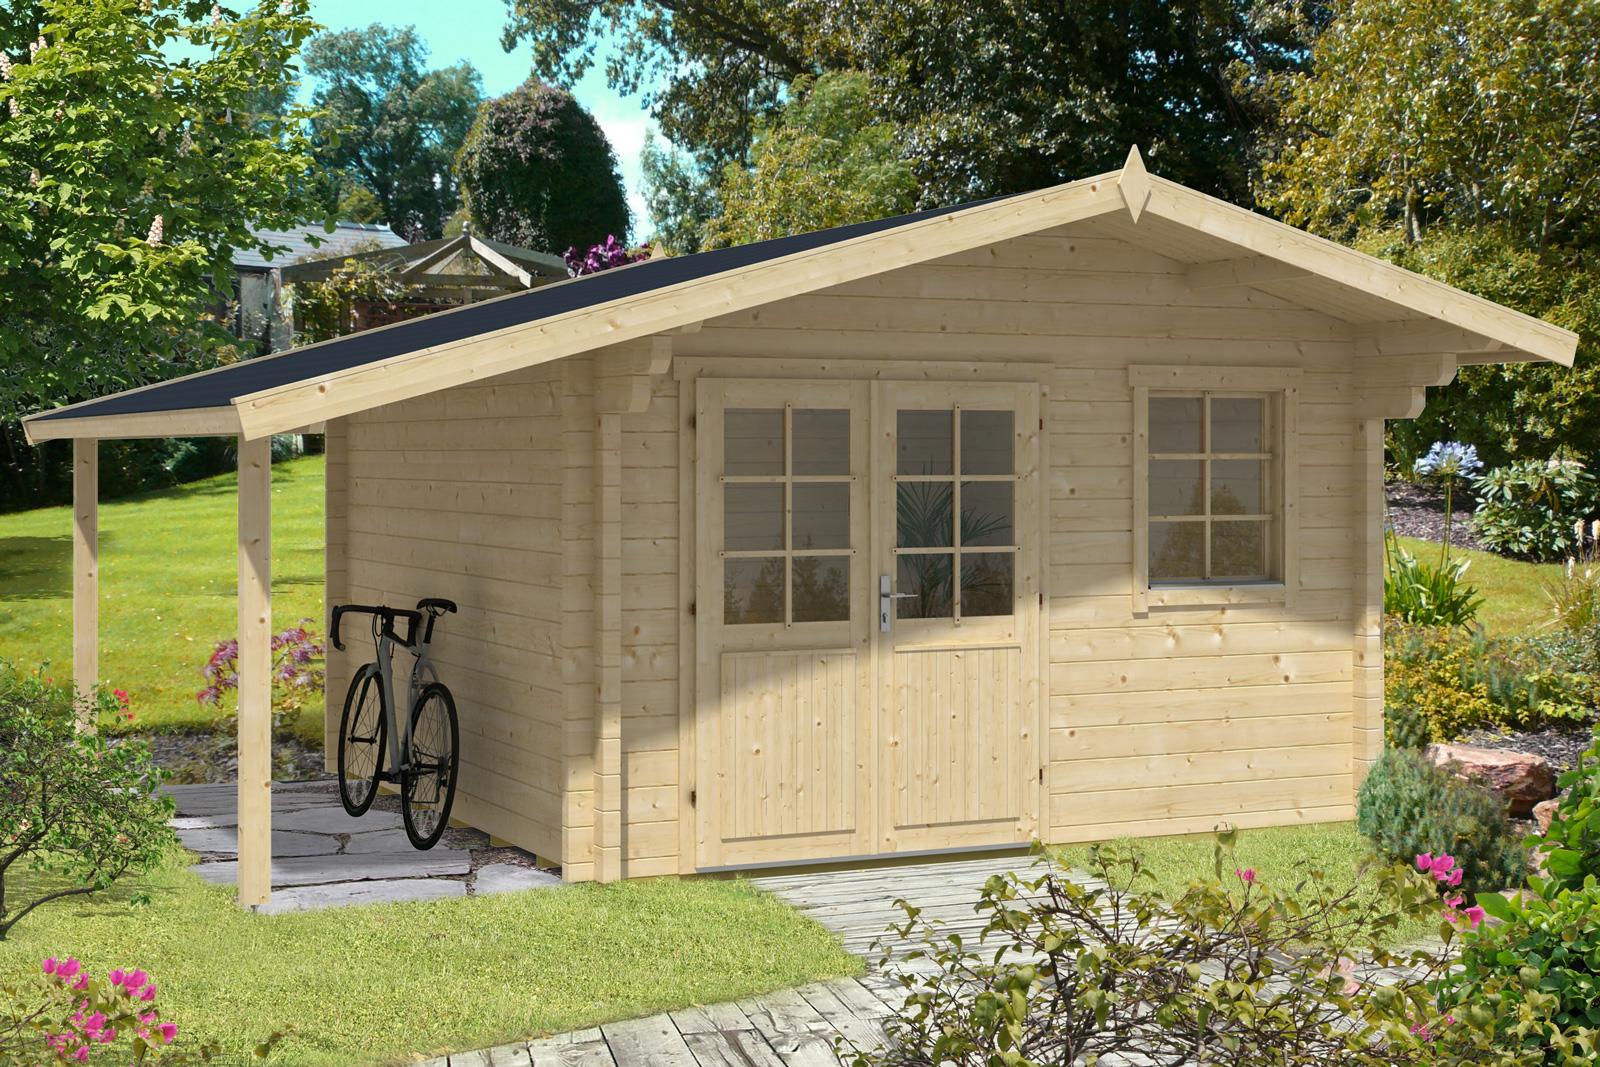 gartenhaus modell franco 70 premium gartenhaus modell. Black Bedroom Furniture Sets. Home Design Ideas